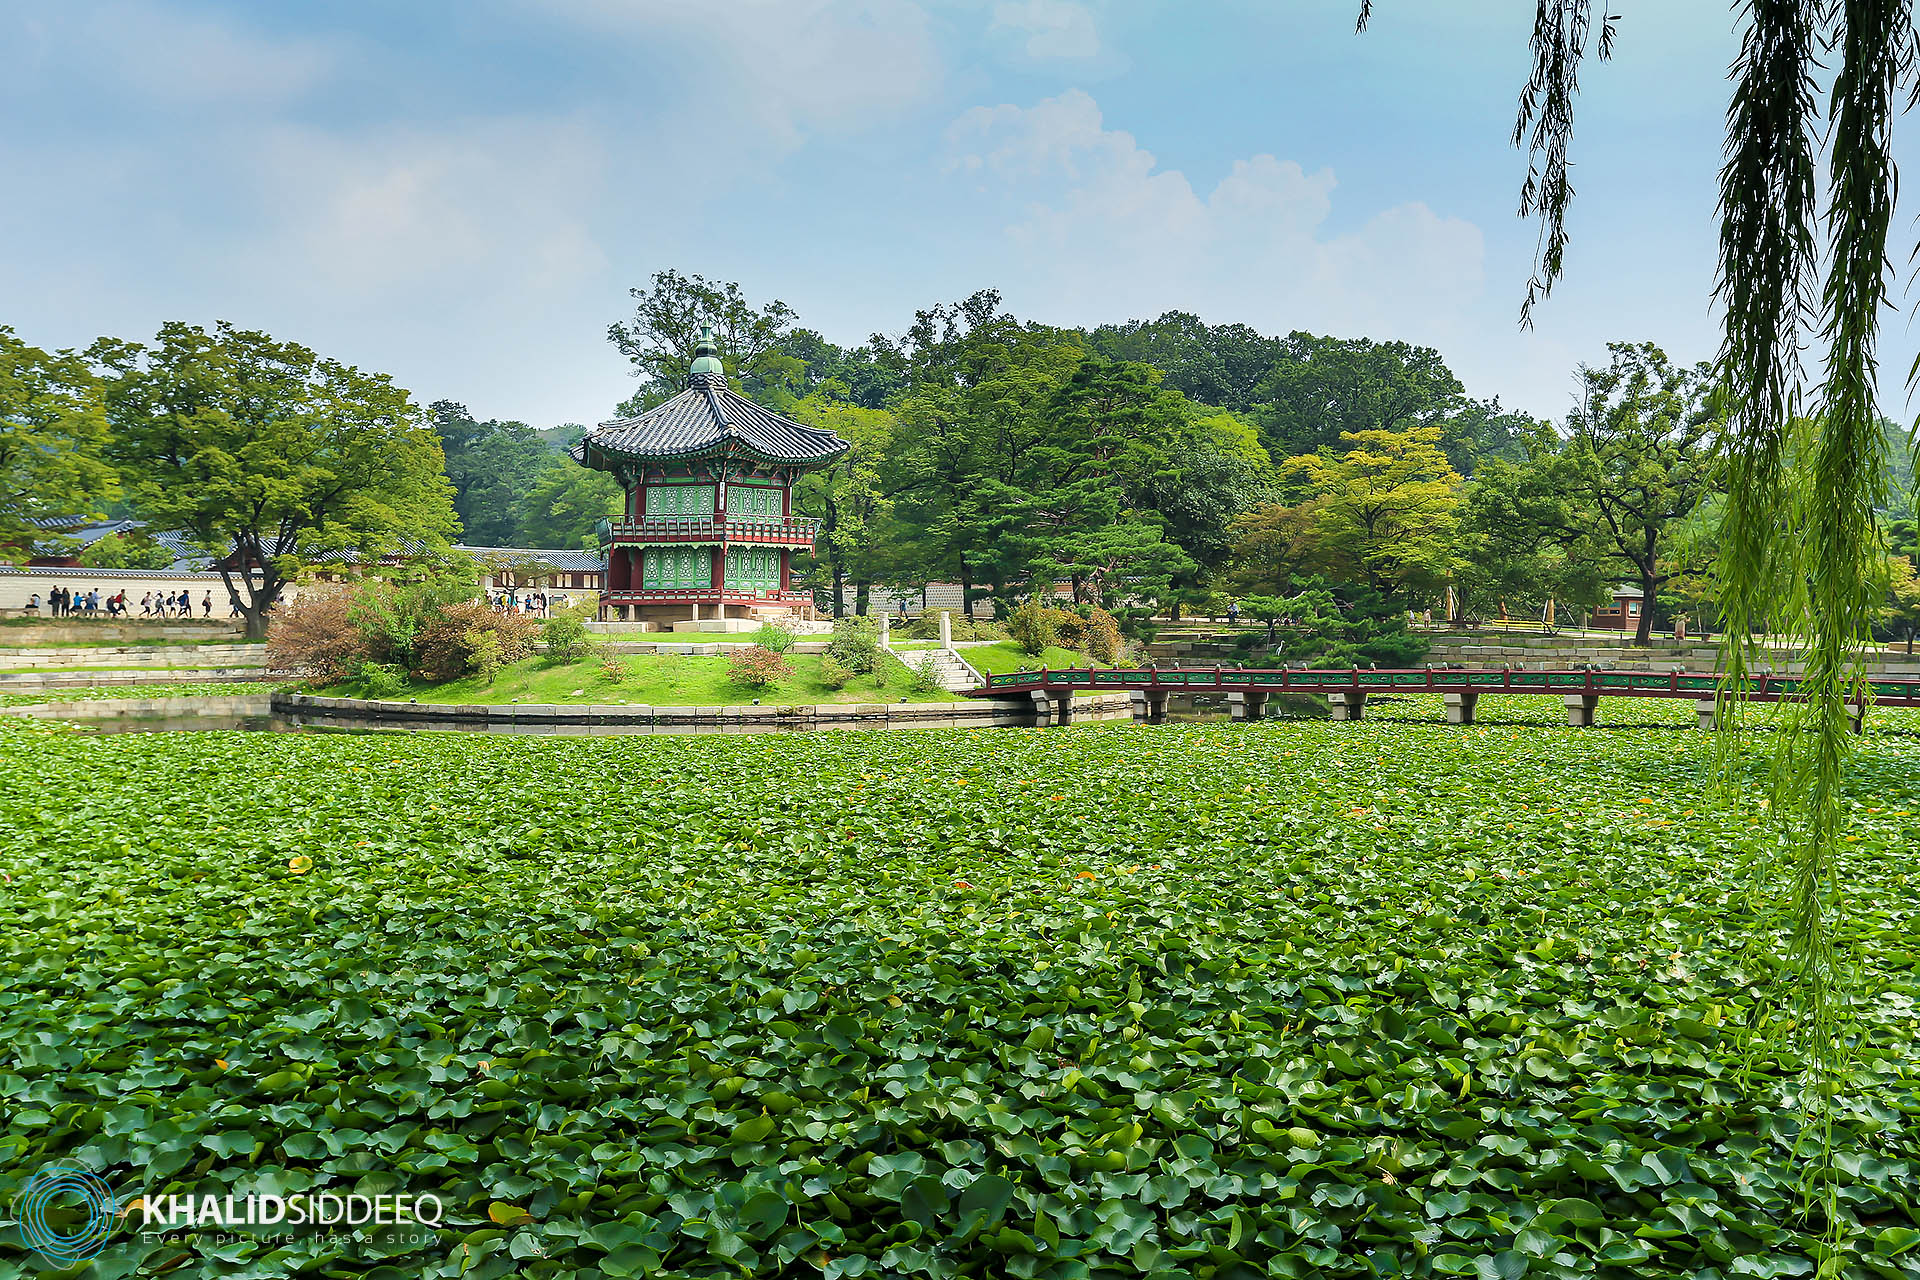 قصر تشانغ ديوك ونغ في سيئول